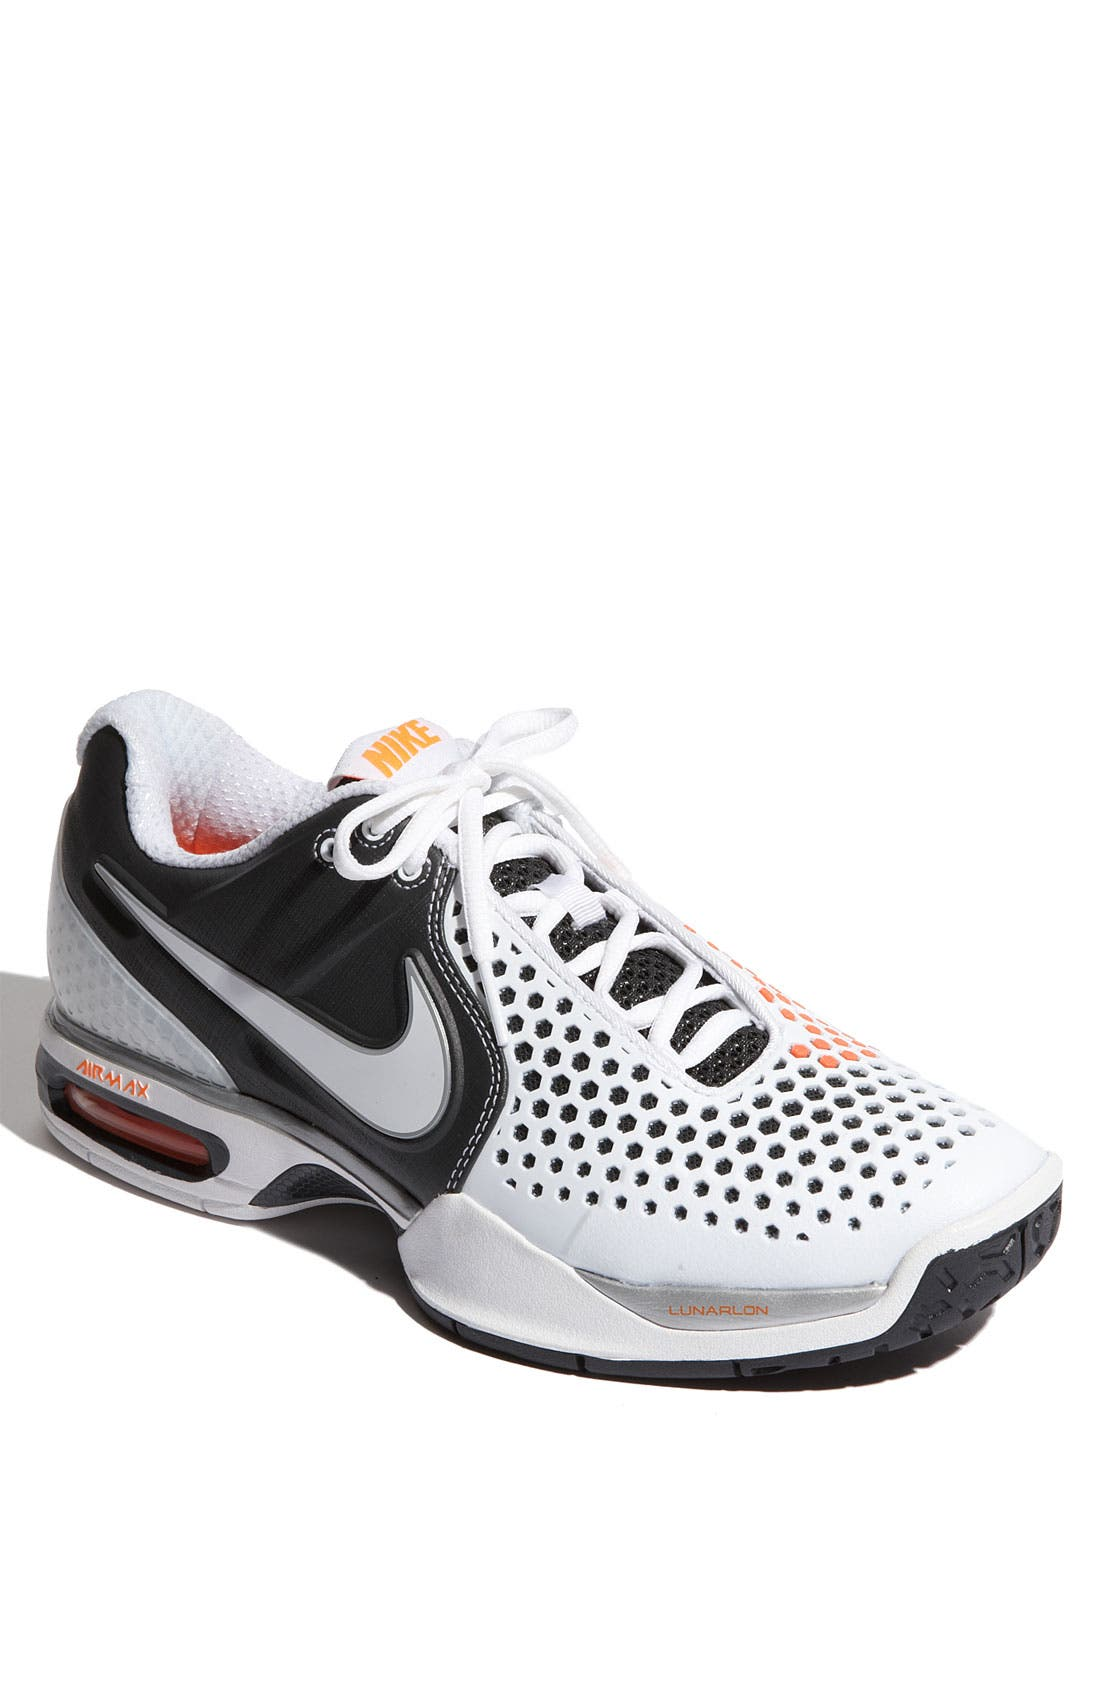 Alternate Image 1 Selected - Nike 'Air Max Court Ballistic 3.3' Tennis Shoe (Men)